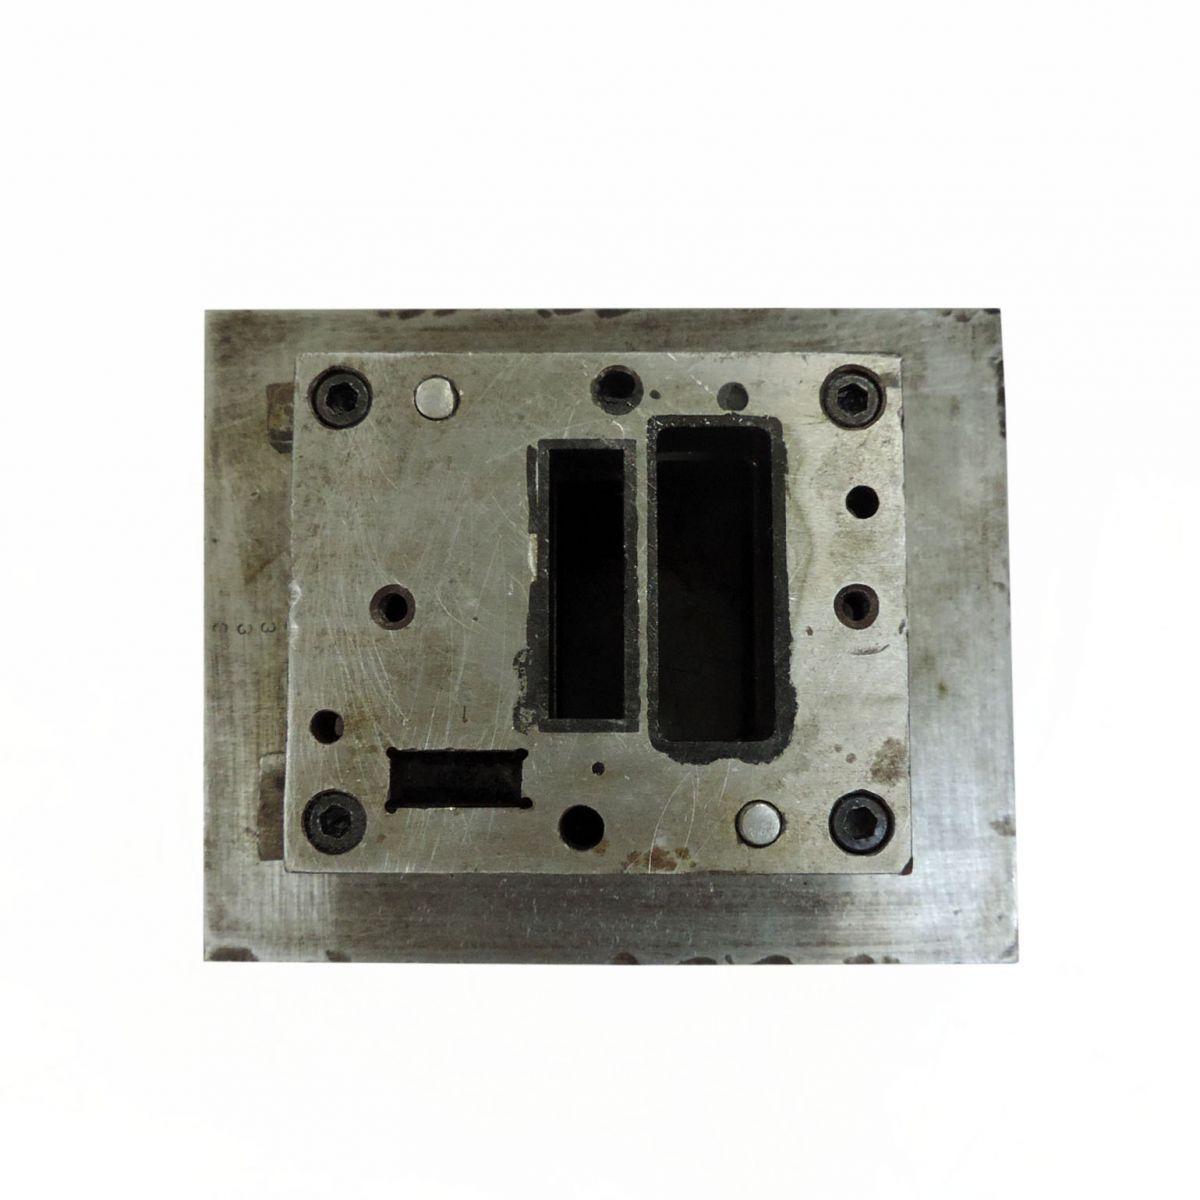 Estampo Prensa Excêntrica Hidráulica Estamparia ST15  - Usado